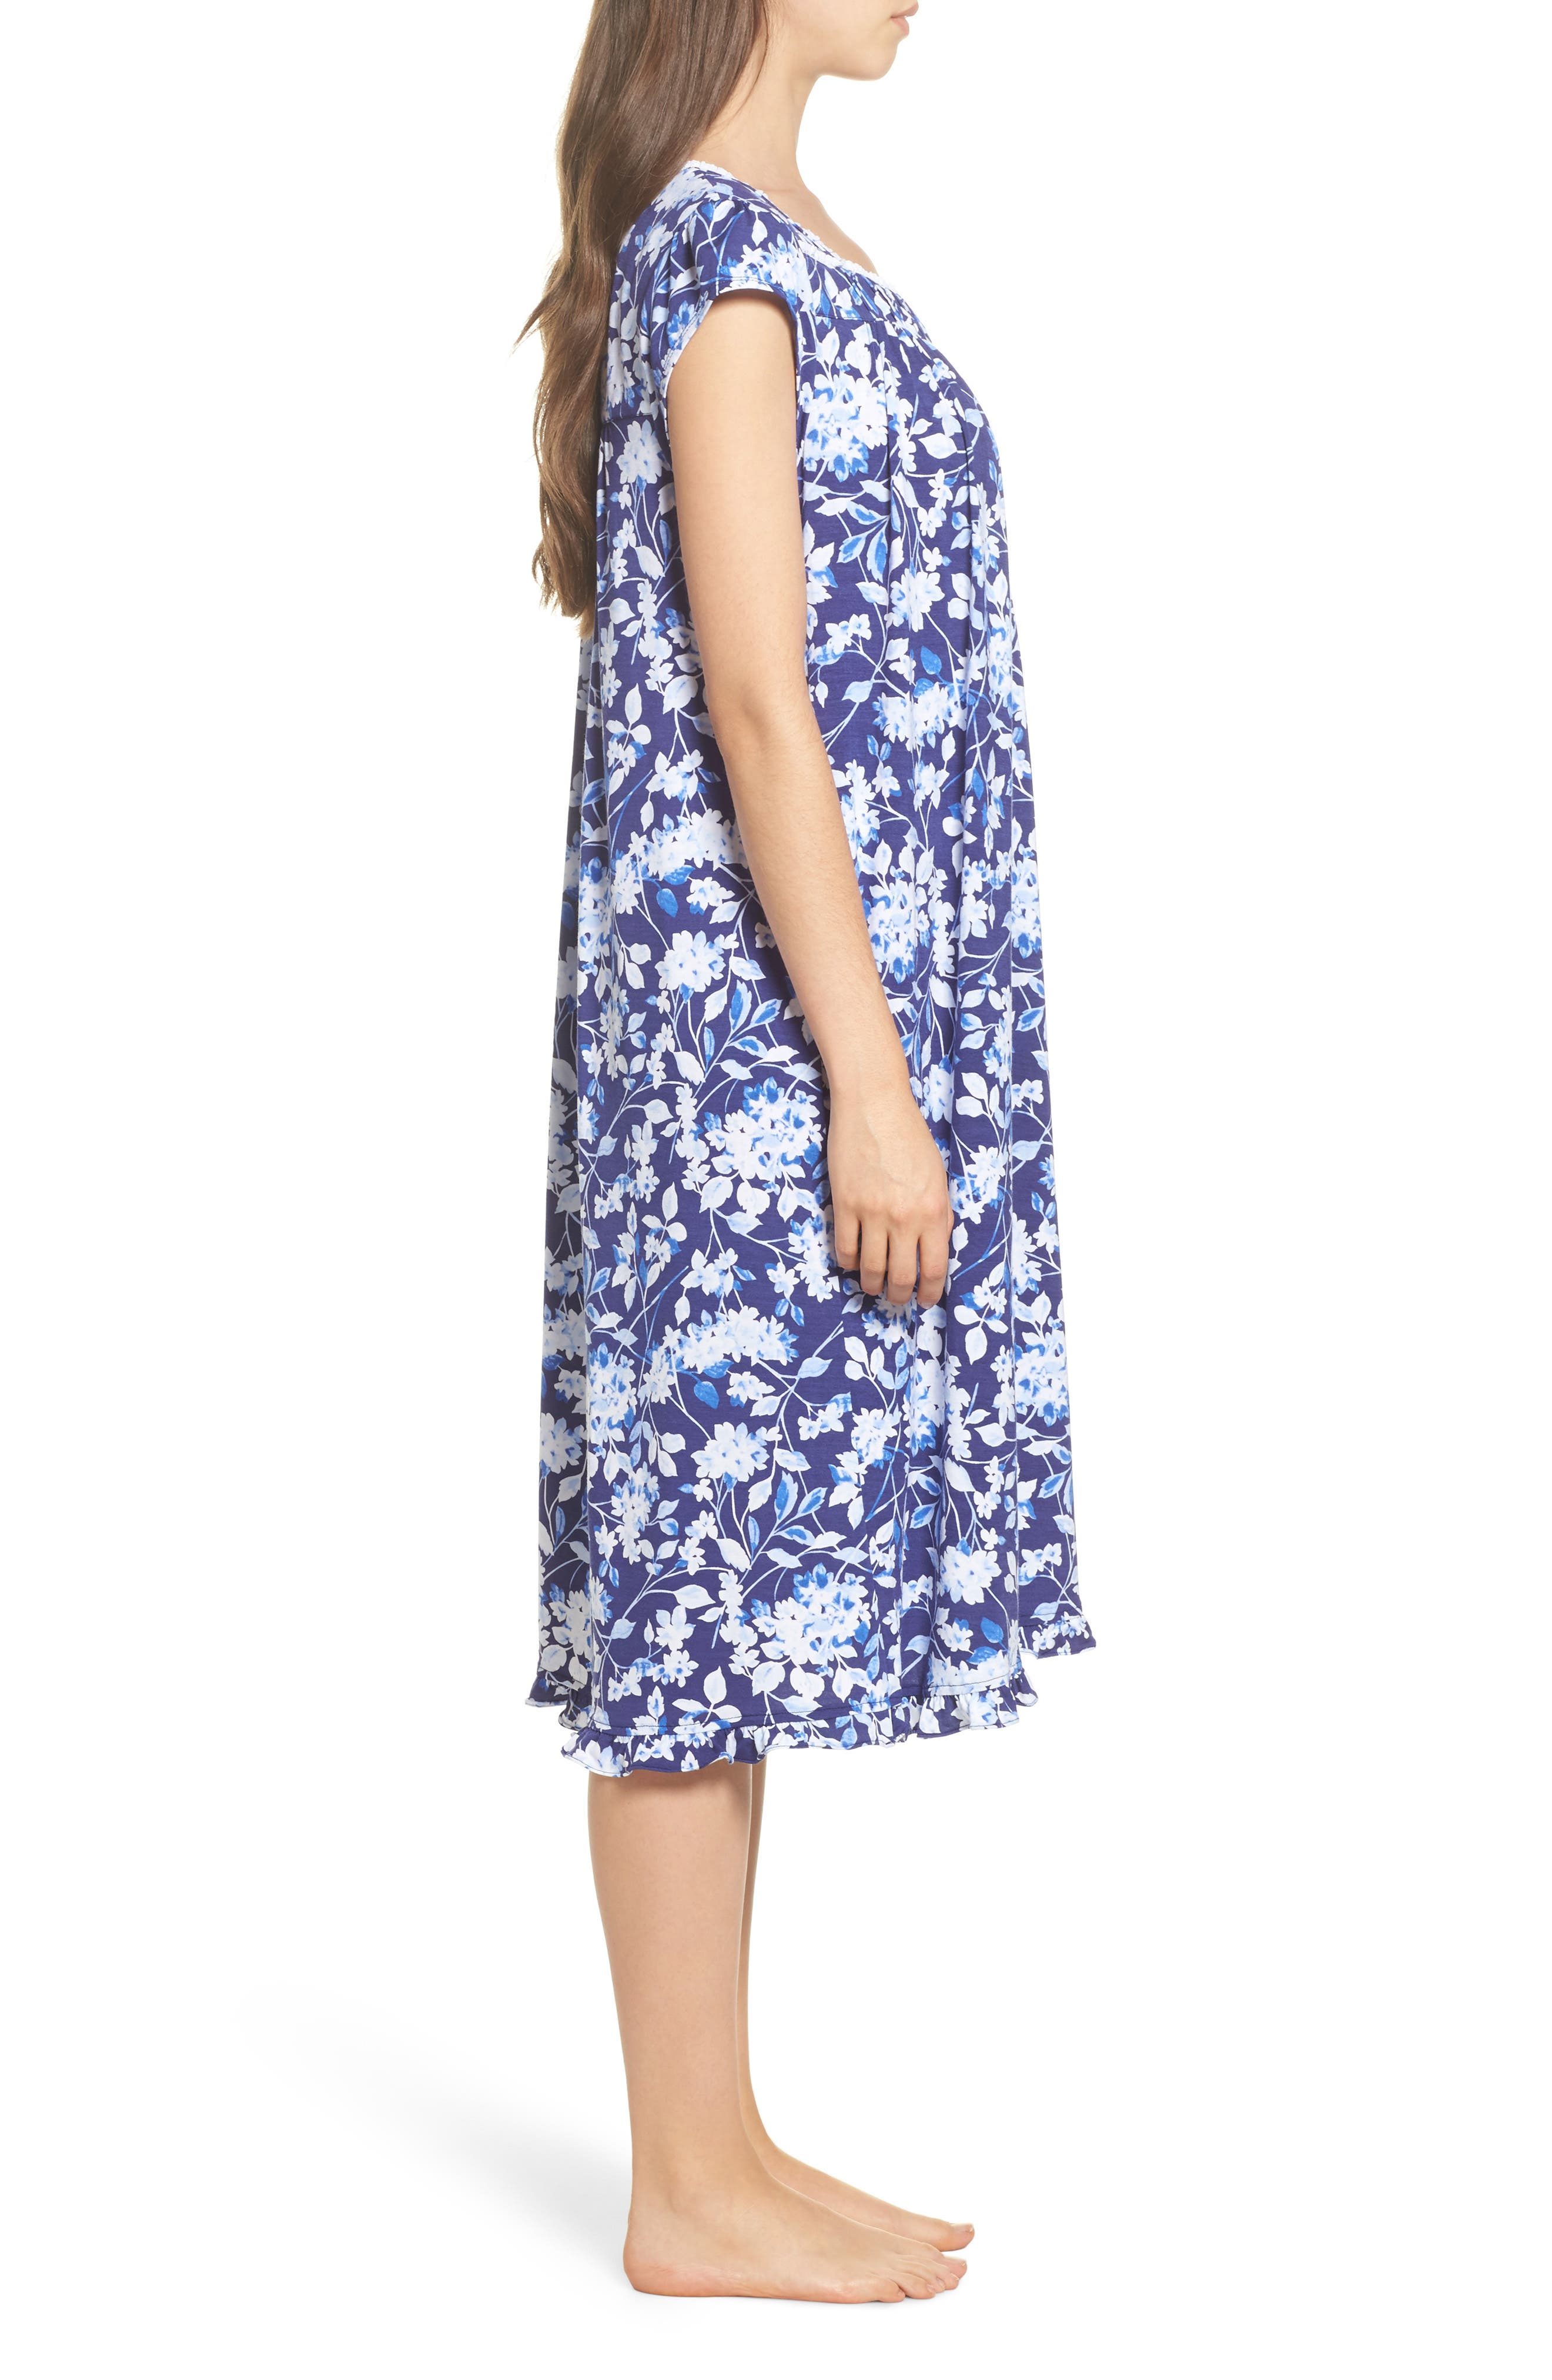 Waltz Nightgown,                             Alternate thumbnail 3, color,                             Blue Multi Floral